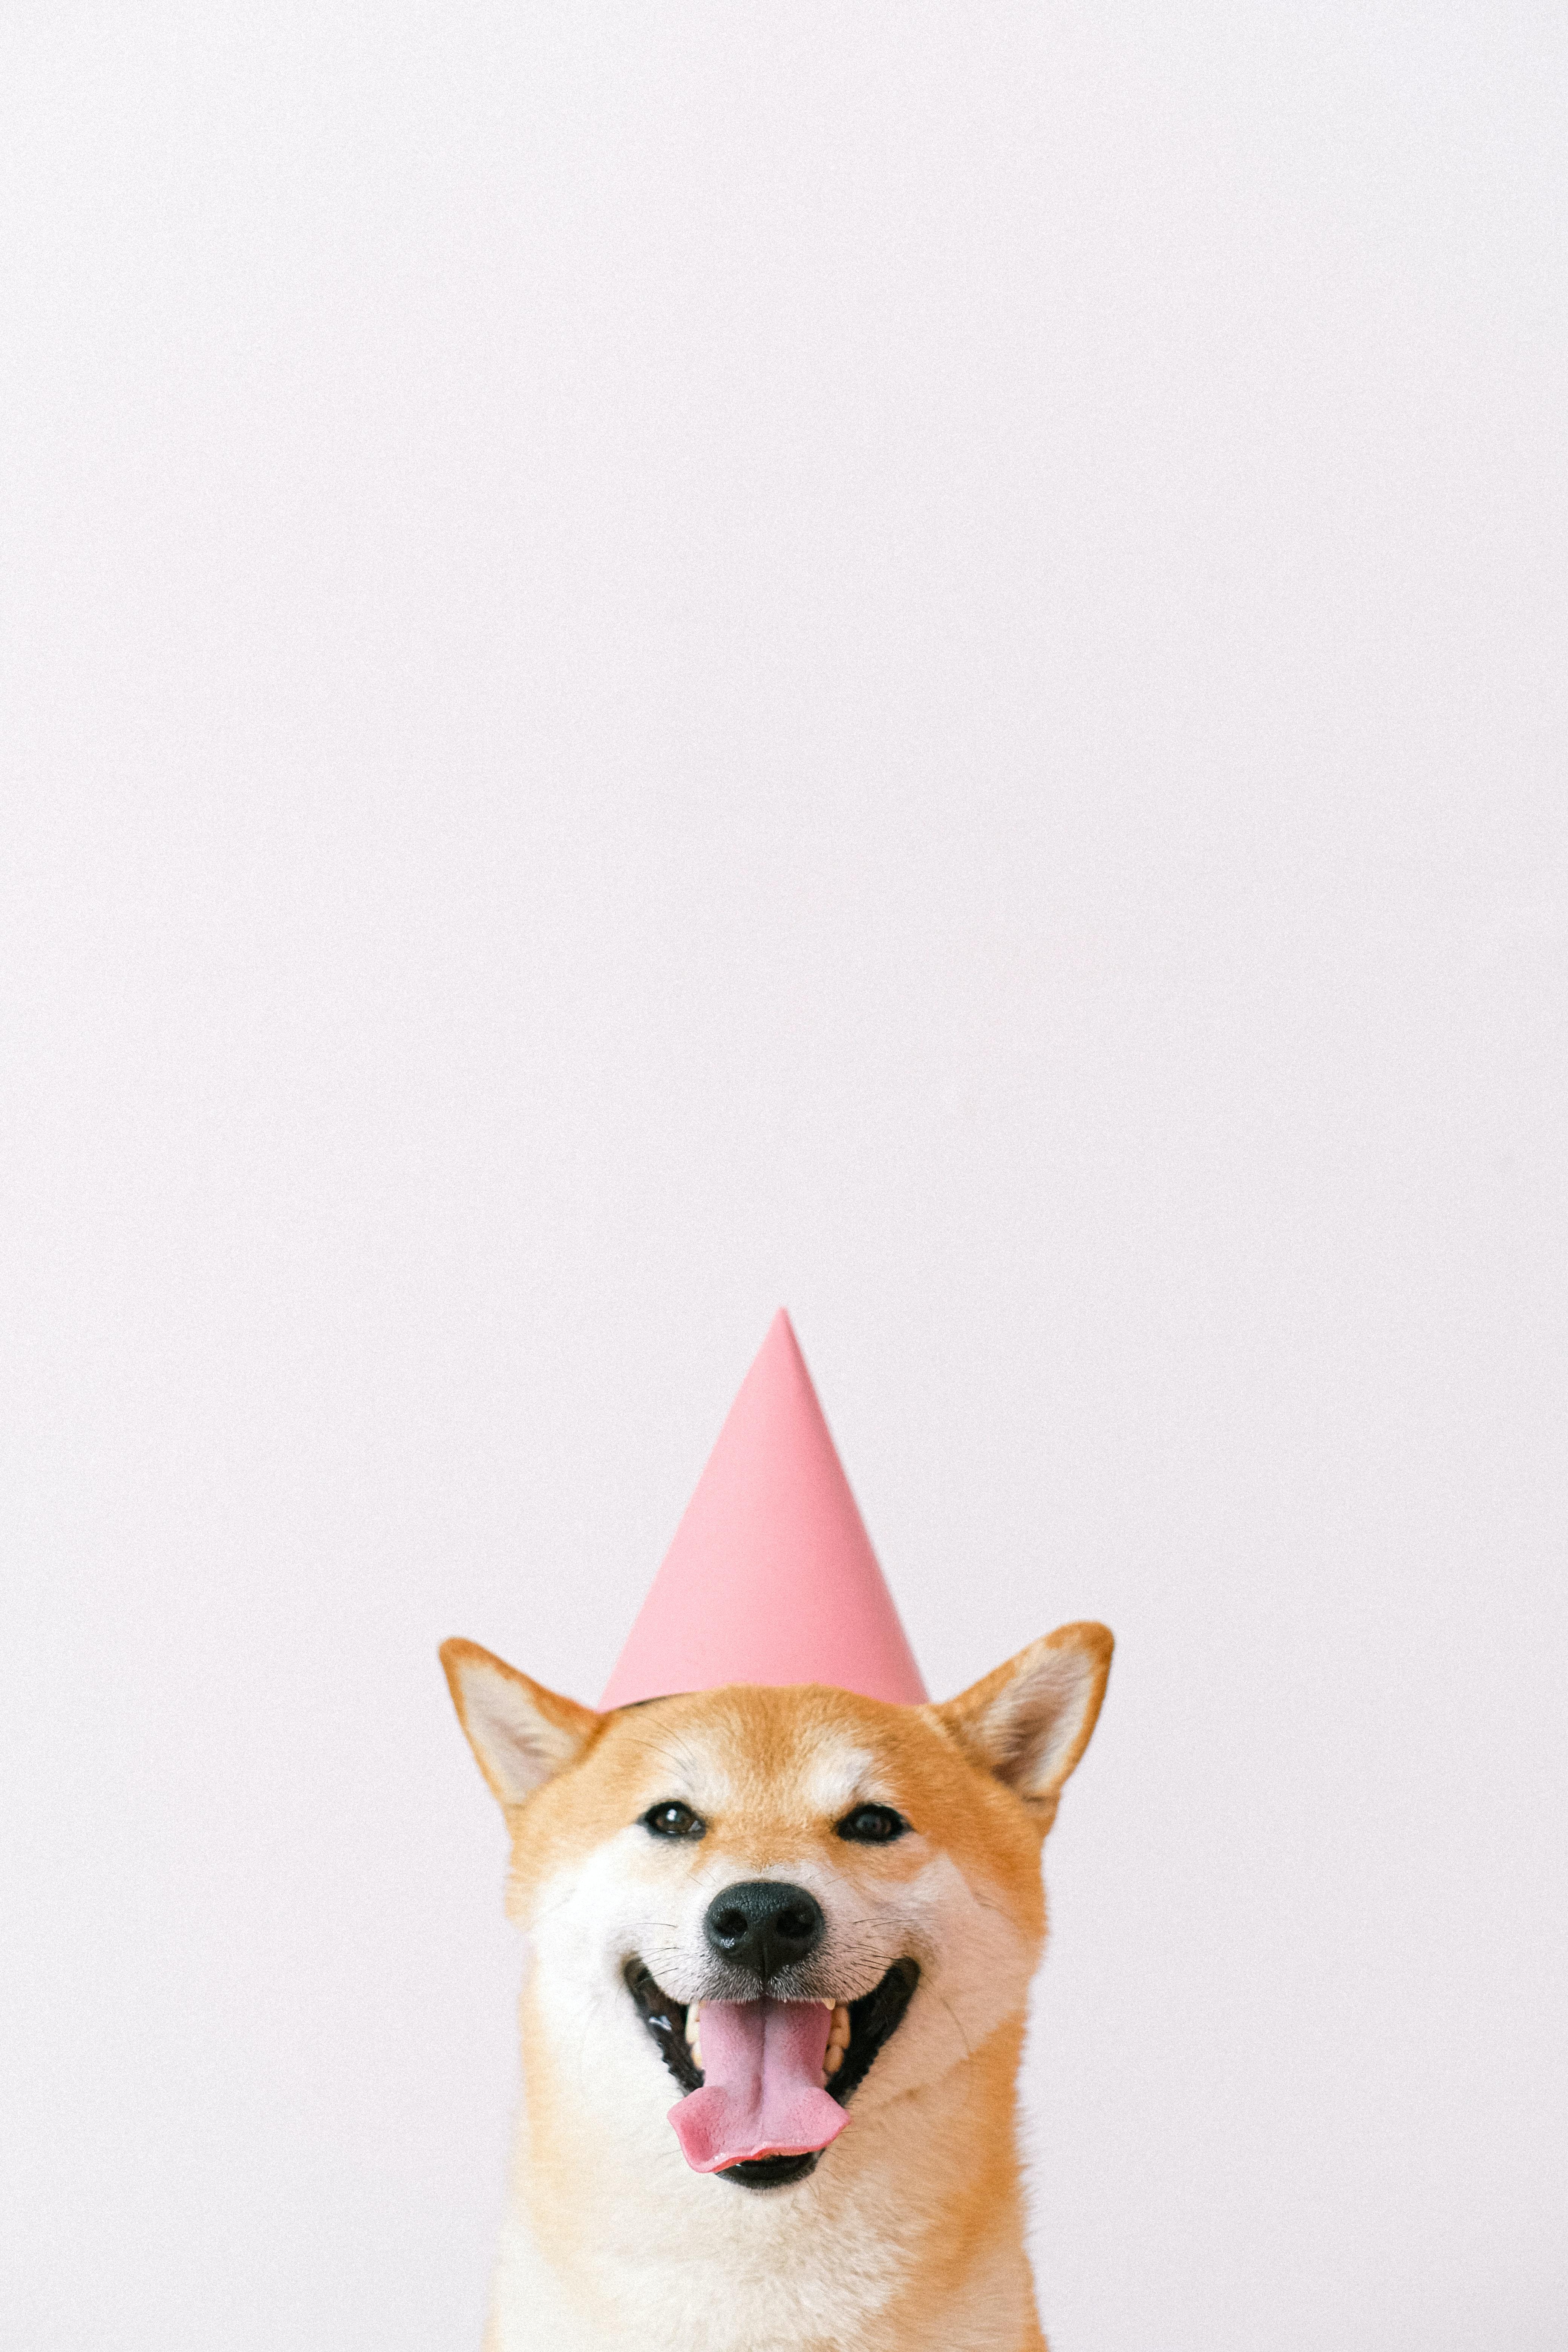 cute dog wearing a party hat 4k free wallpaper